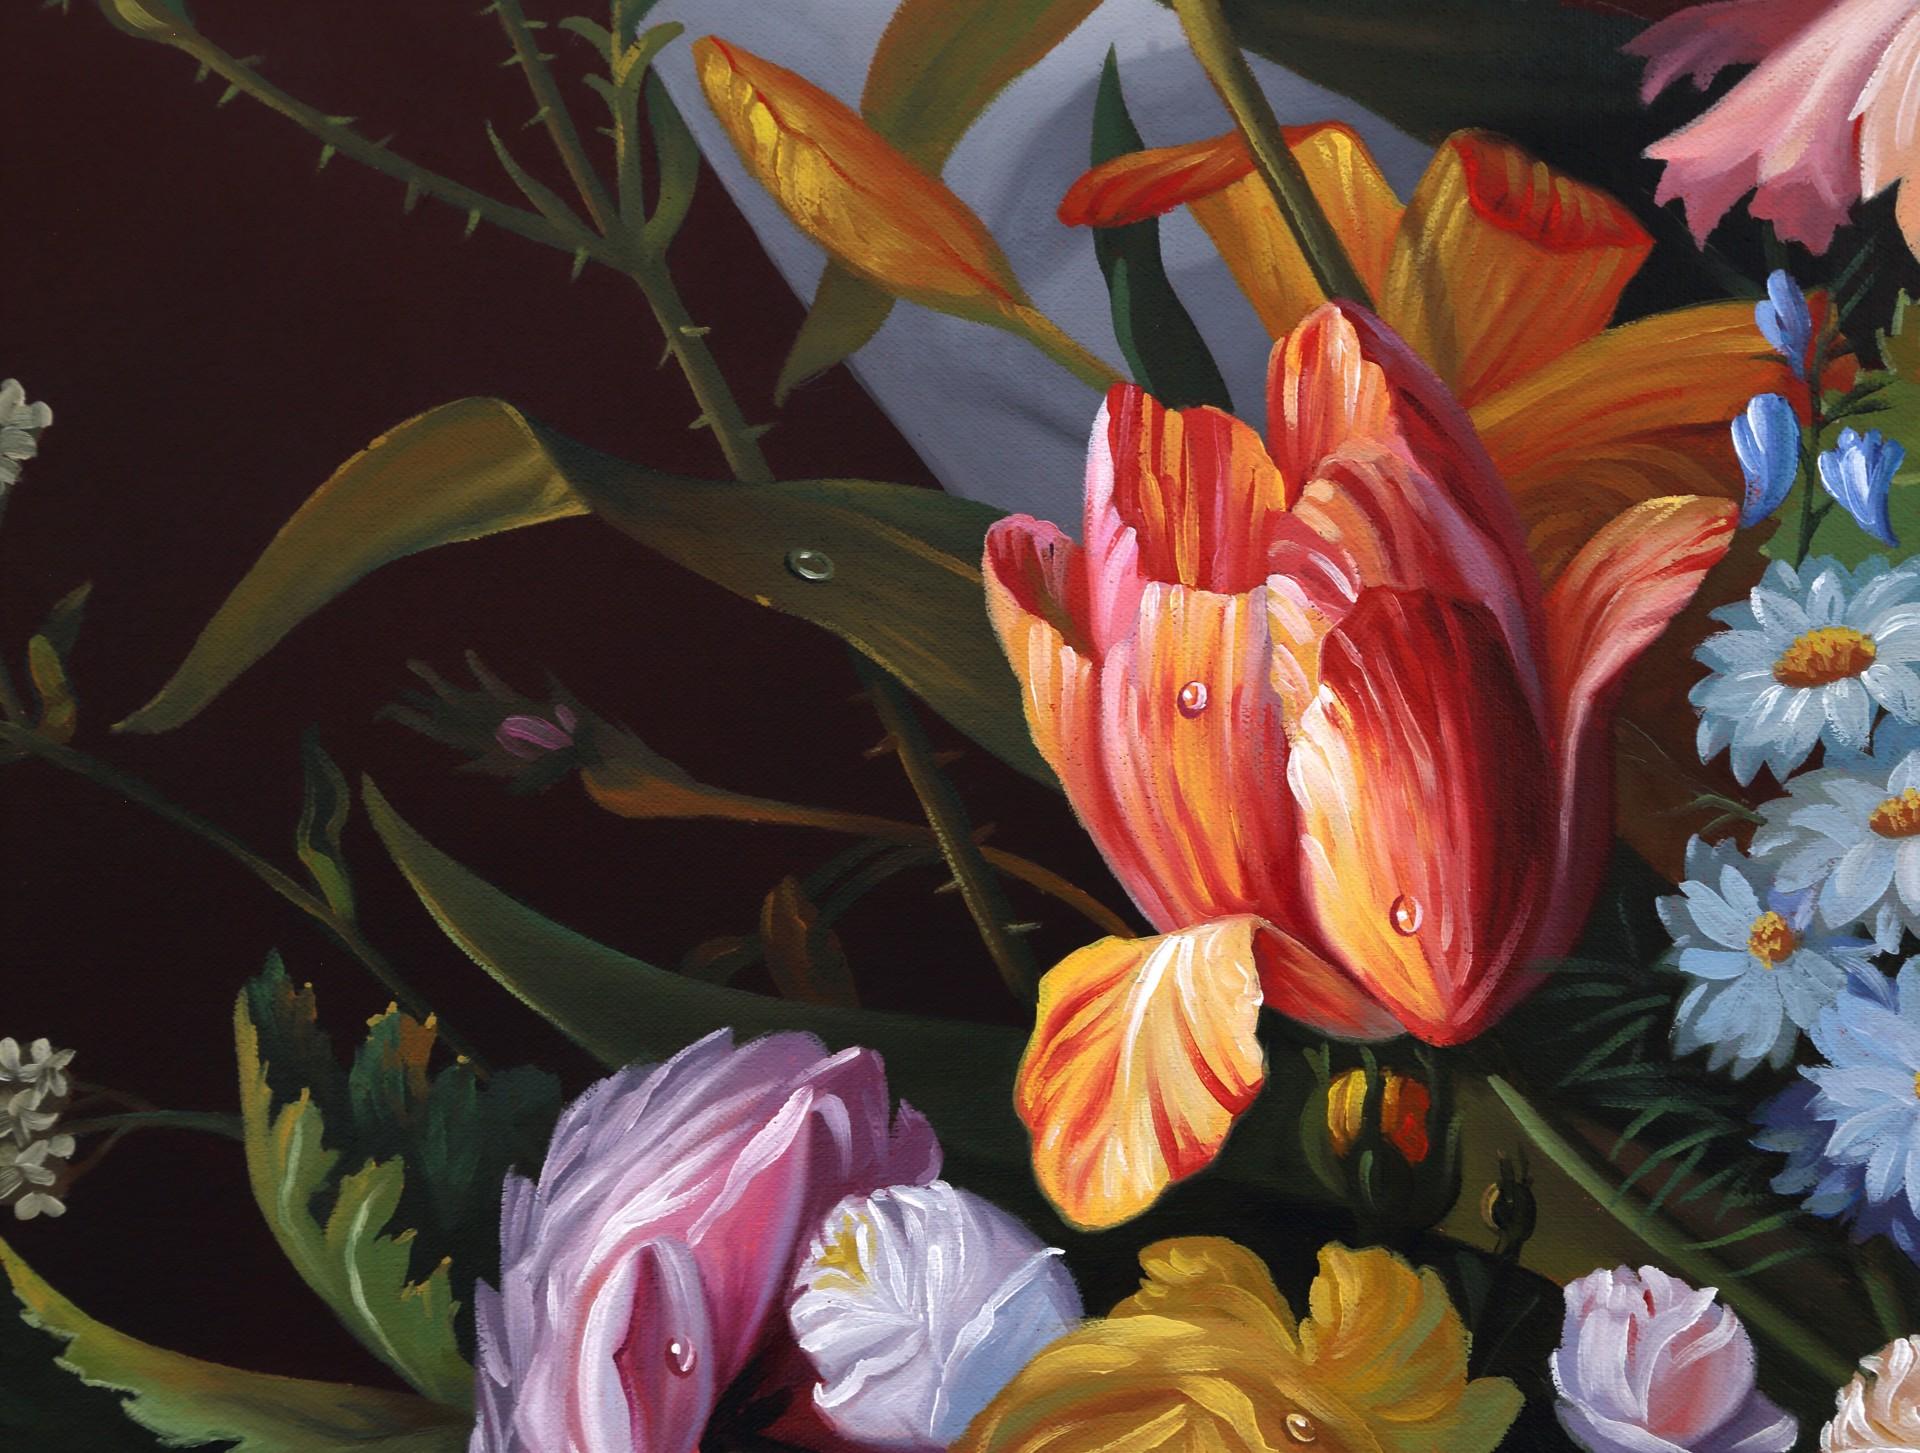 (Flower Still Life With Bird's Nest) by Shawn Huckins